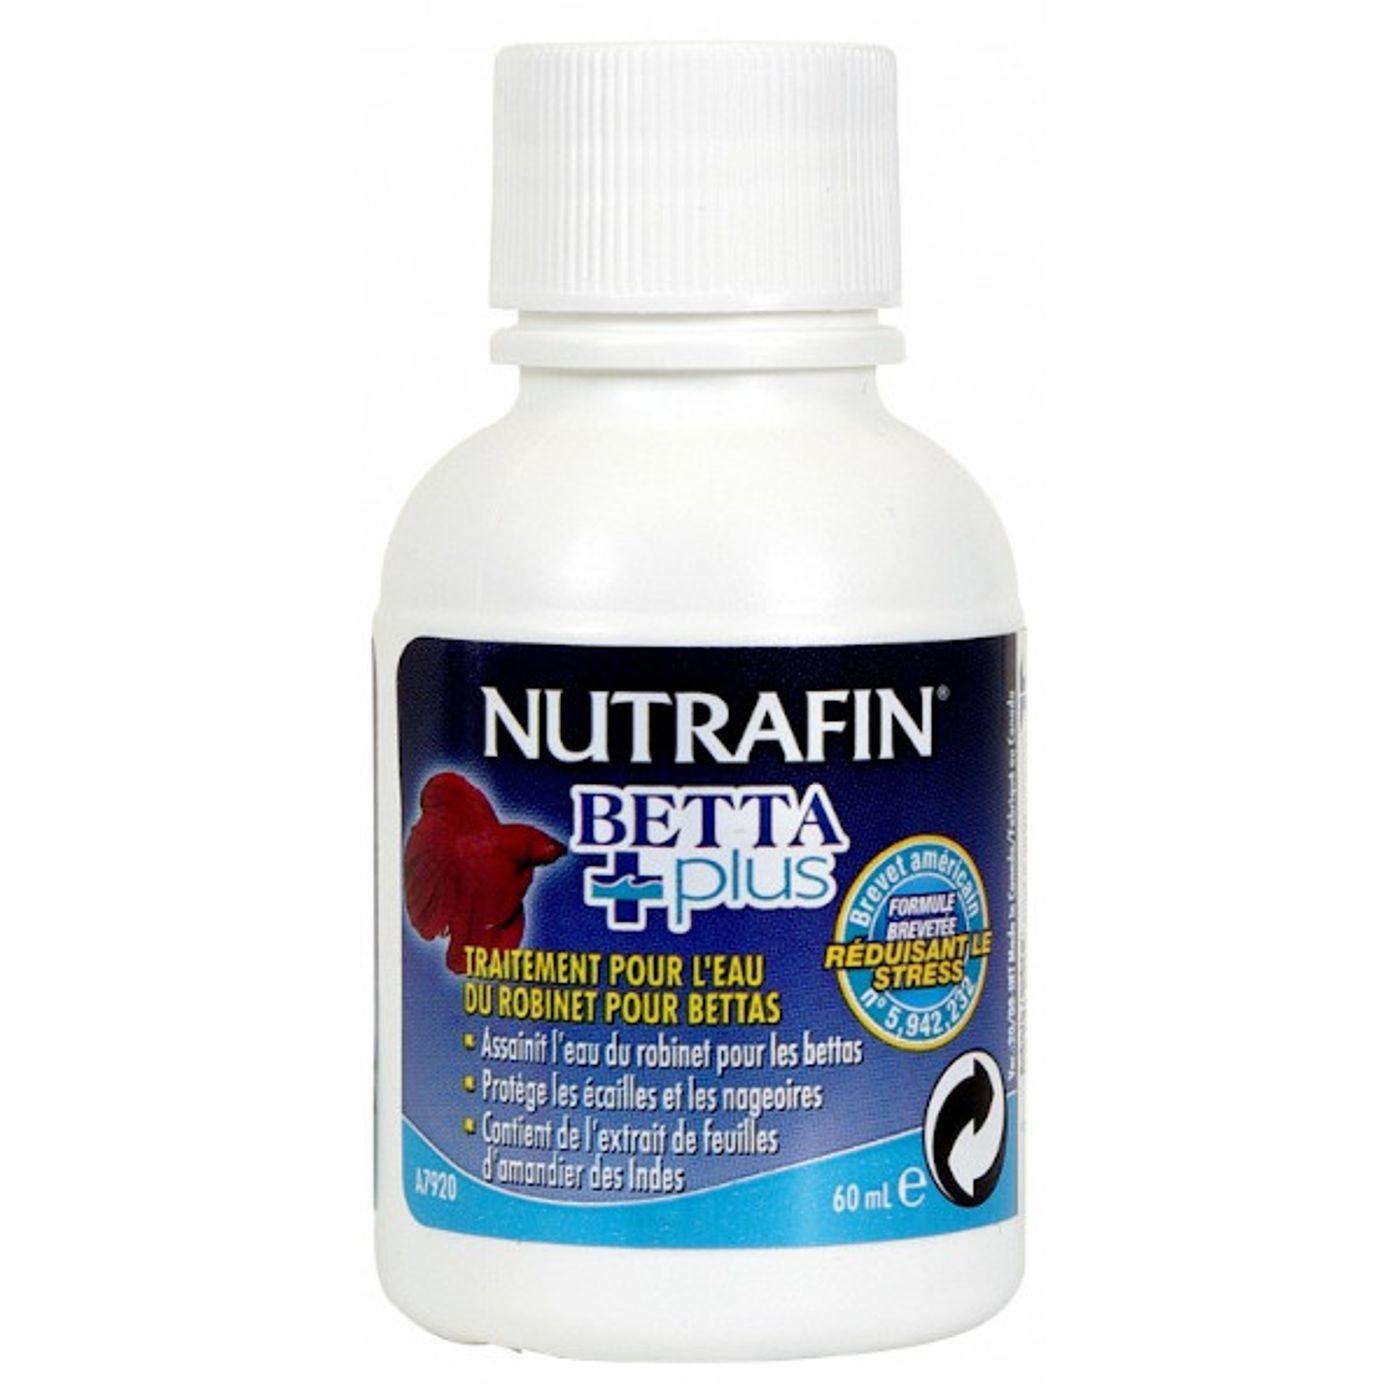 NUTRAFIN-Betta-Plus--60ml-